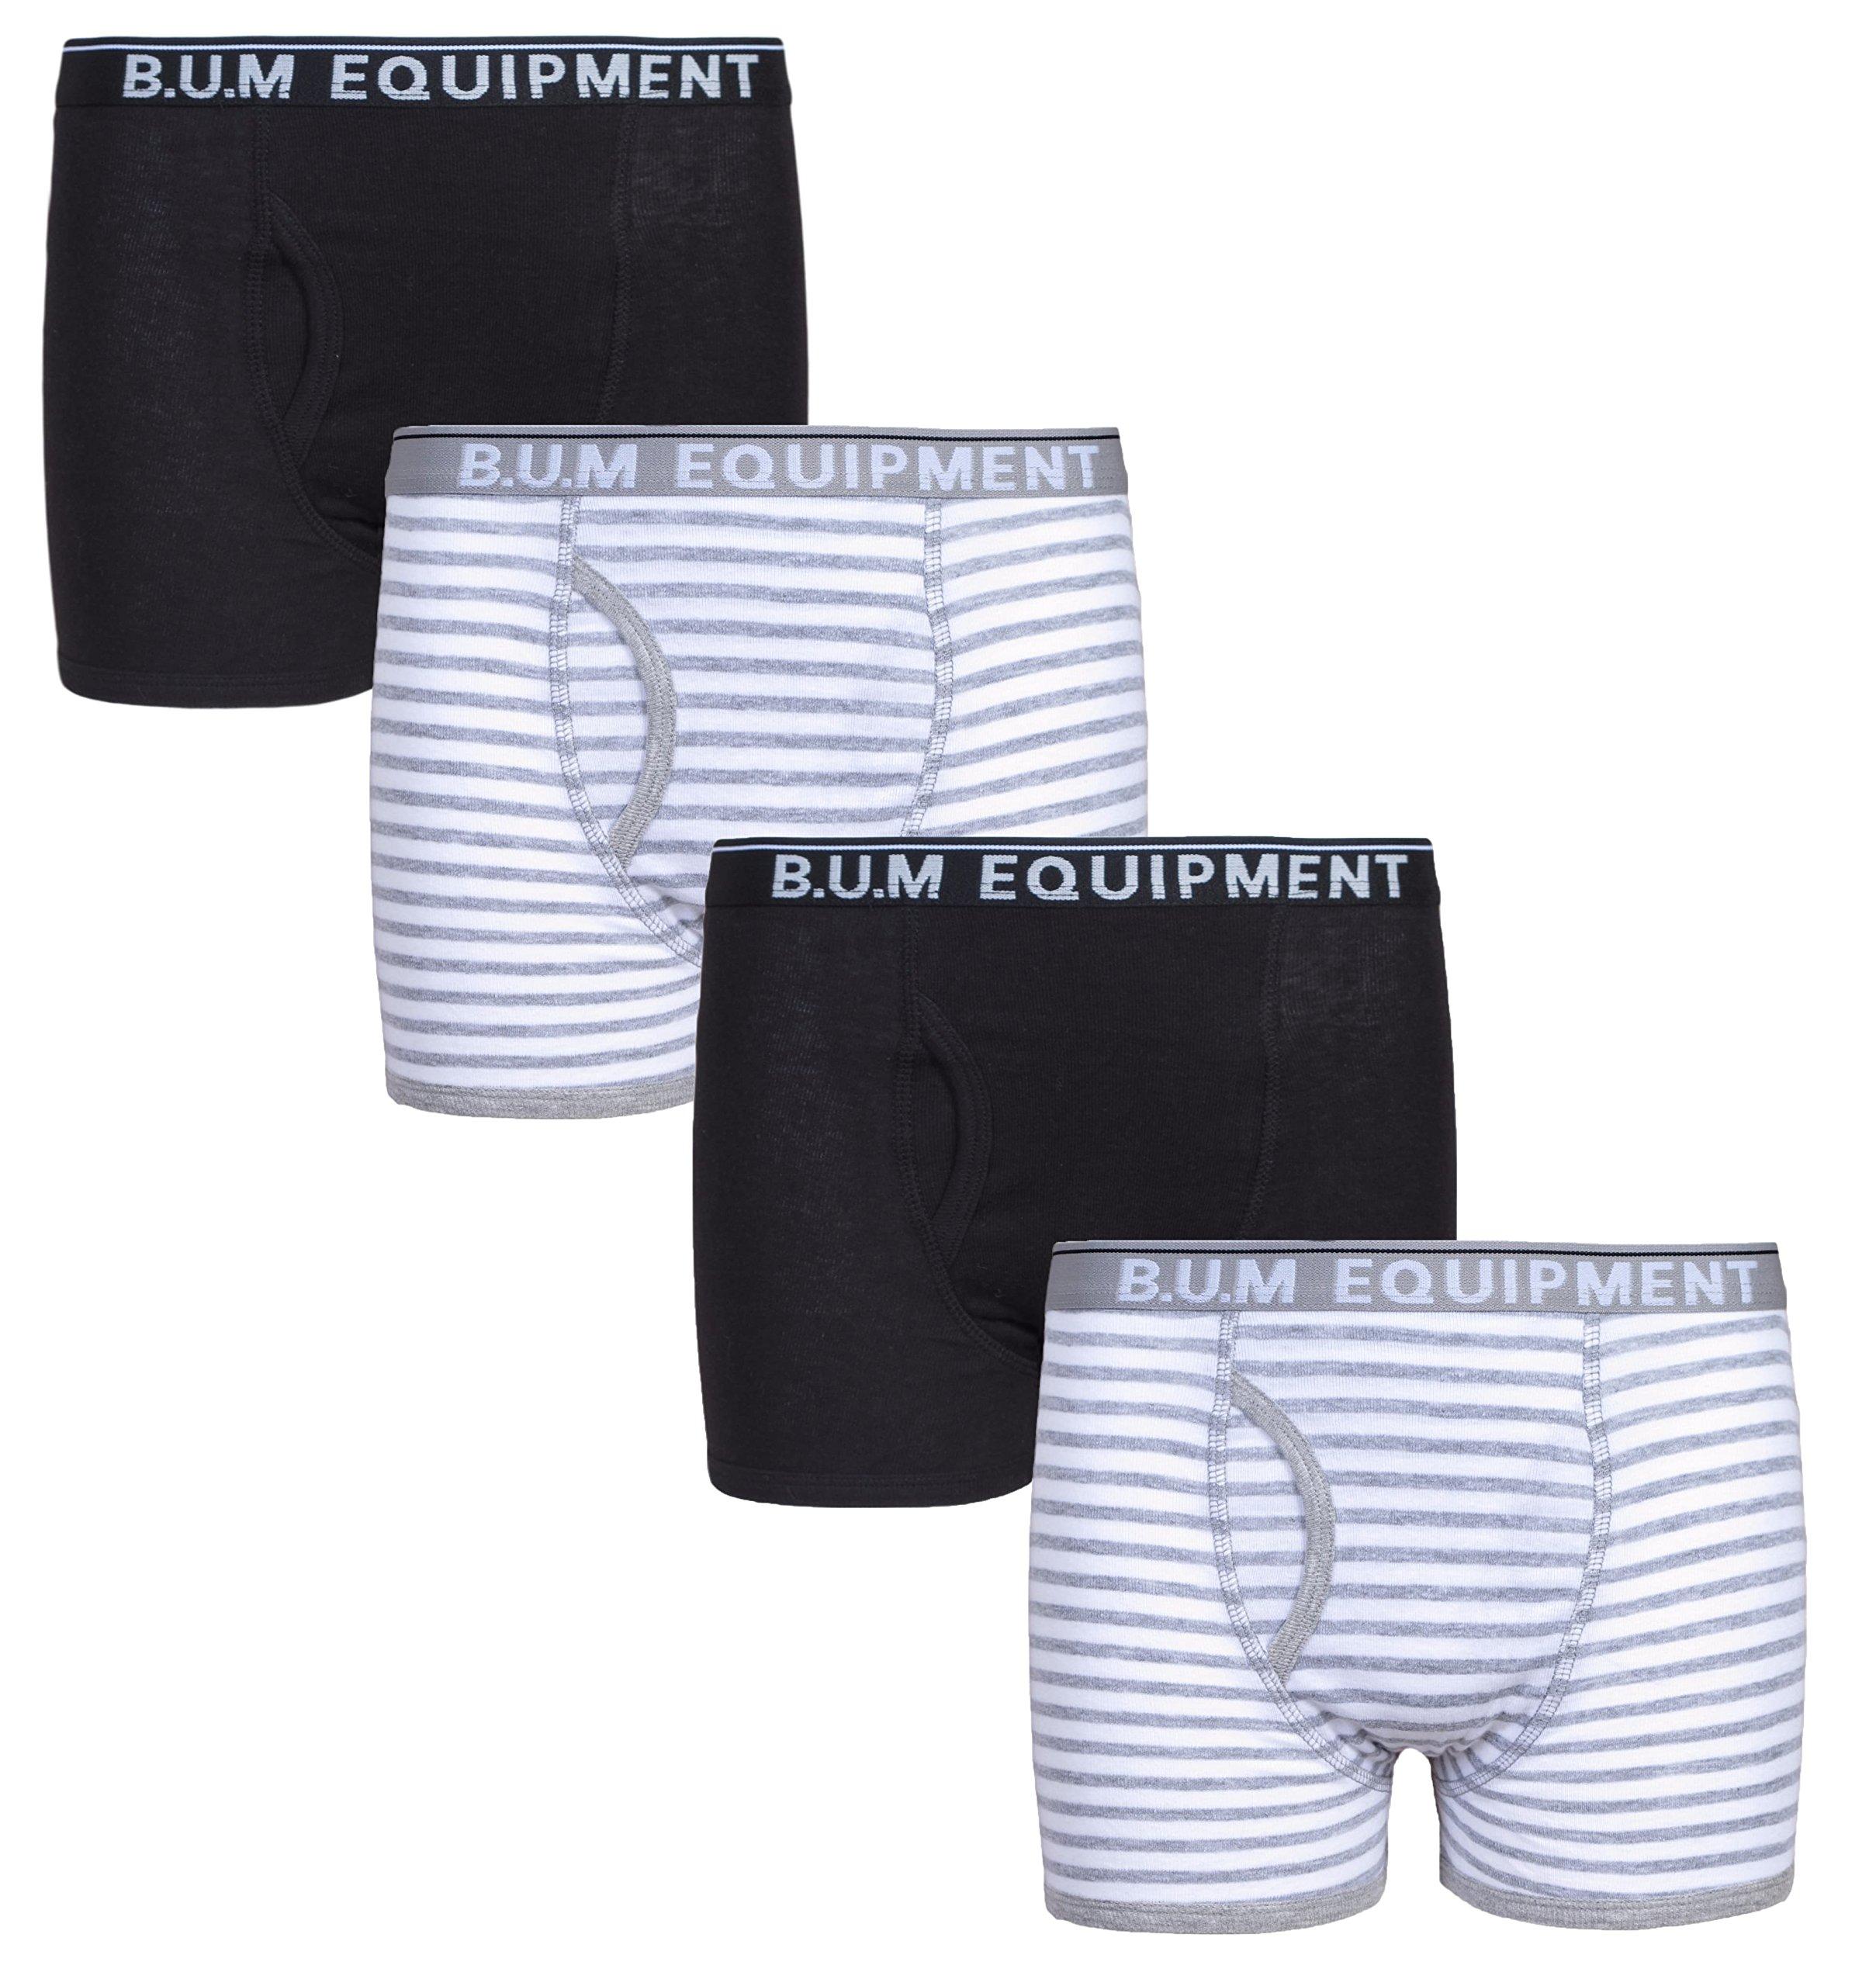 B.U.M. Equipment Boys 4 Pack Solid Underwear Boxer Briefs, Solids and Stripes, Black/Stripes, Medium / 8-10